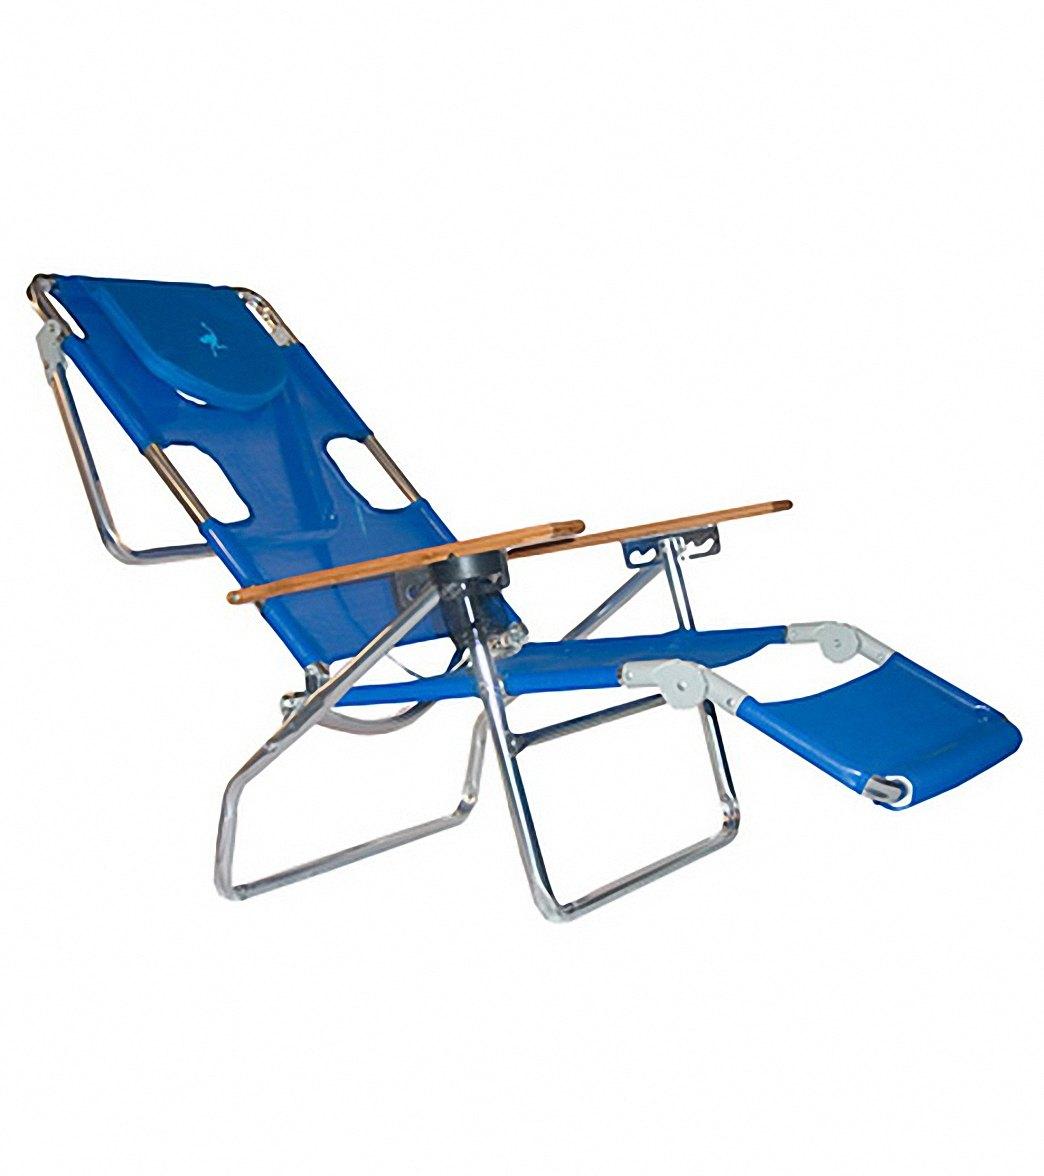 sc 1 st  SwimOutlet.com & Ostrich Face Down 3N1 Beach Chair at SwimOutlet.com - Free Shipping islam-shia.org